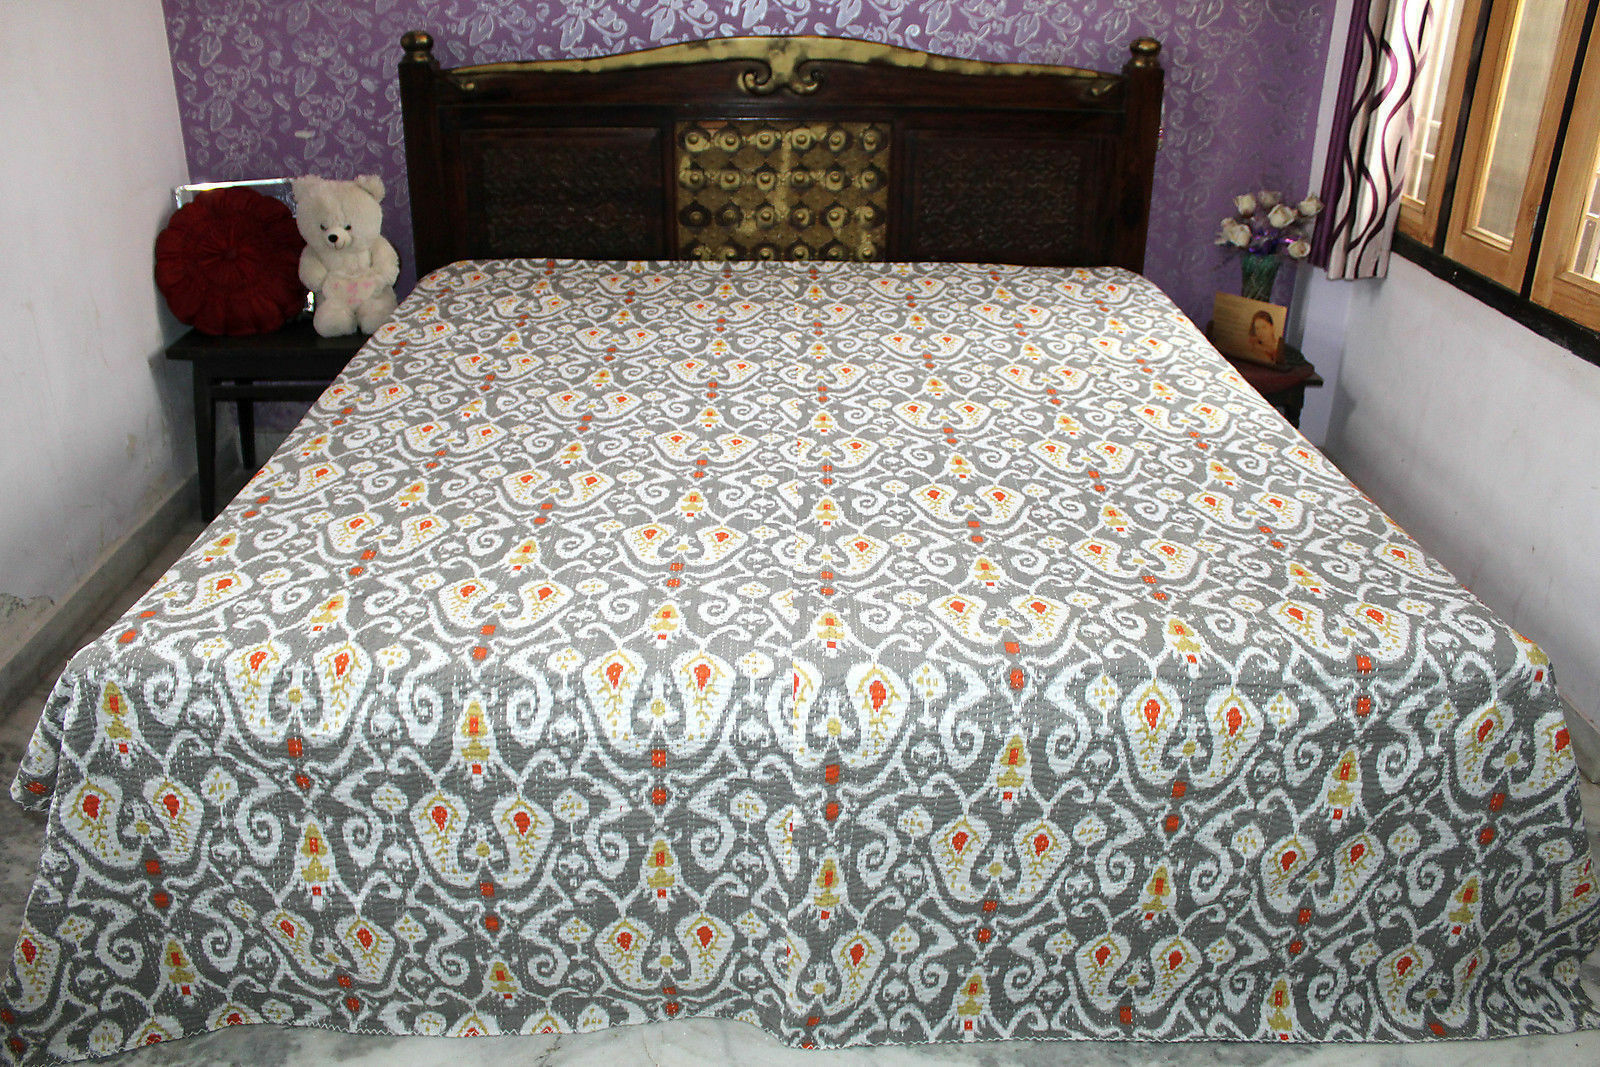 GreIndian handmade Tapestry Twin size Ikat kantha quilt Bedspread Blanket